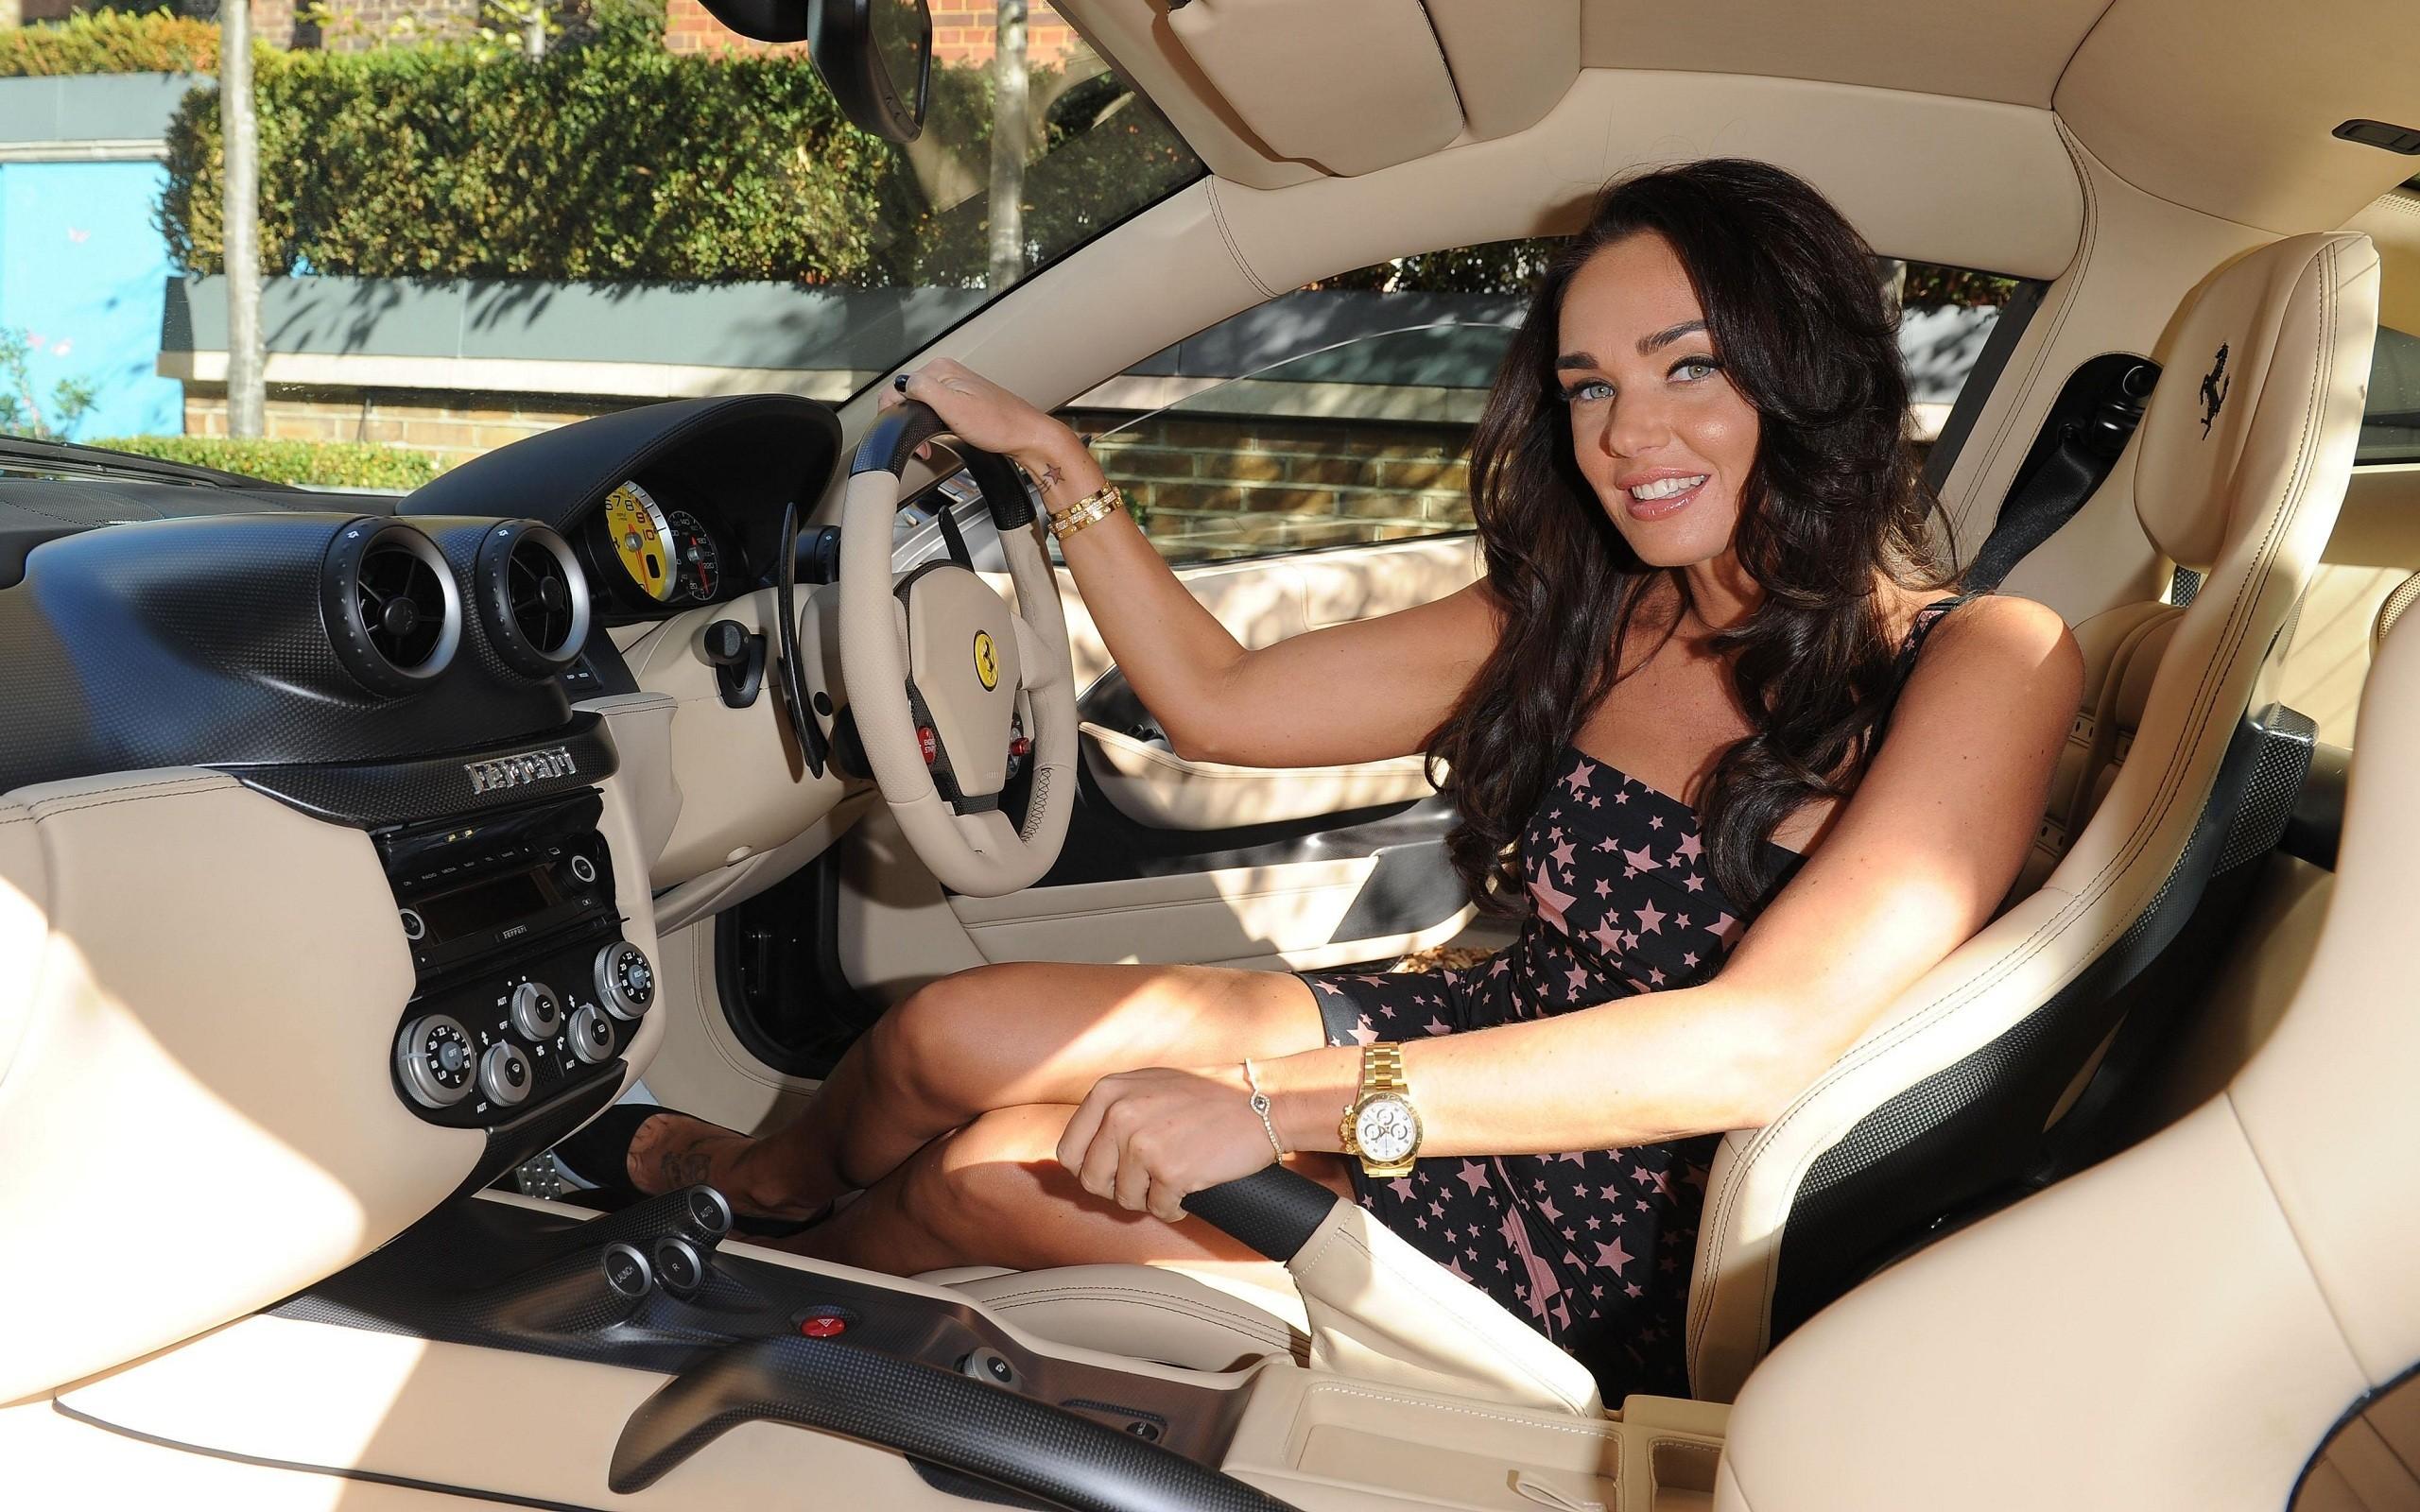 Tamara Ecclestone en lujoso auto - 2560x1600